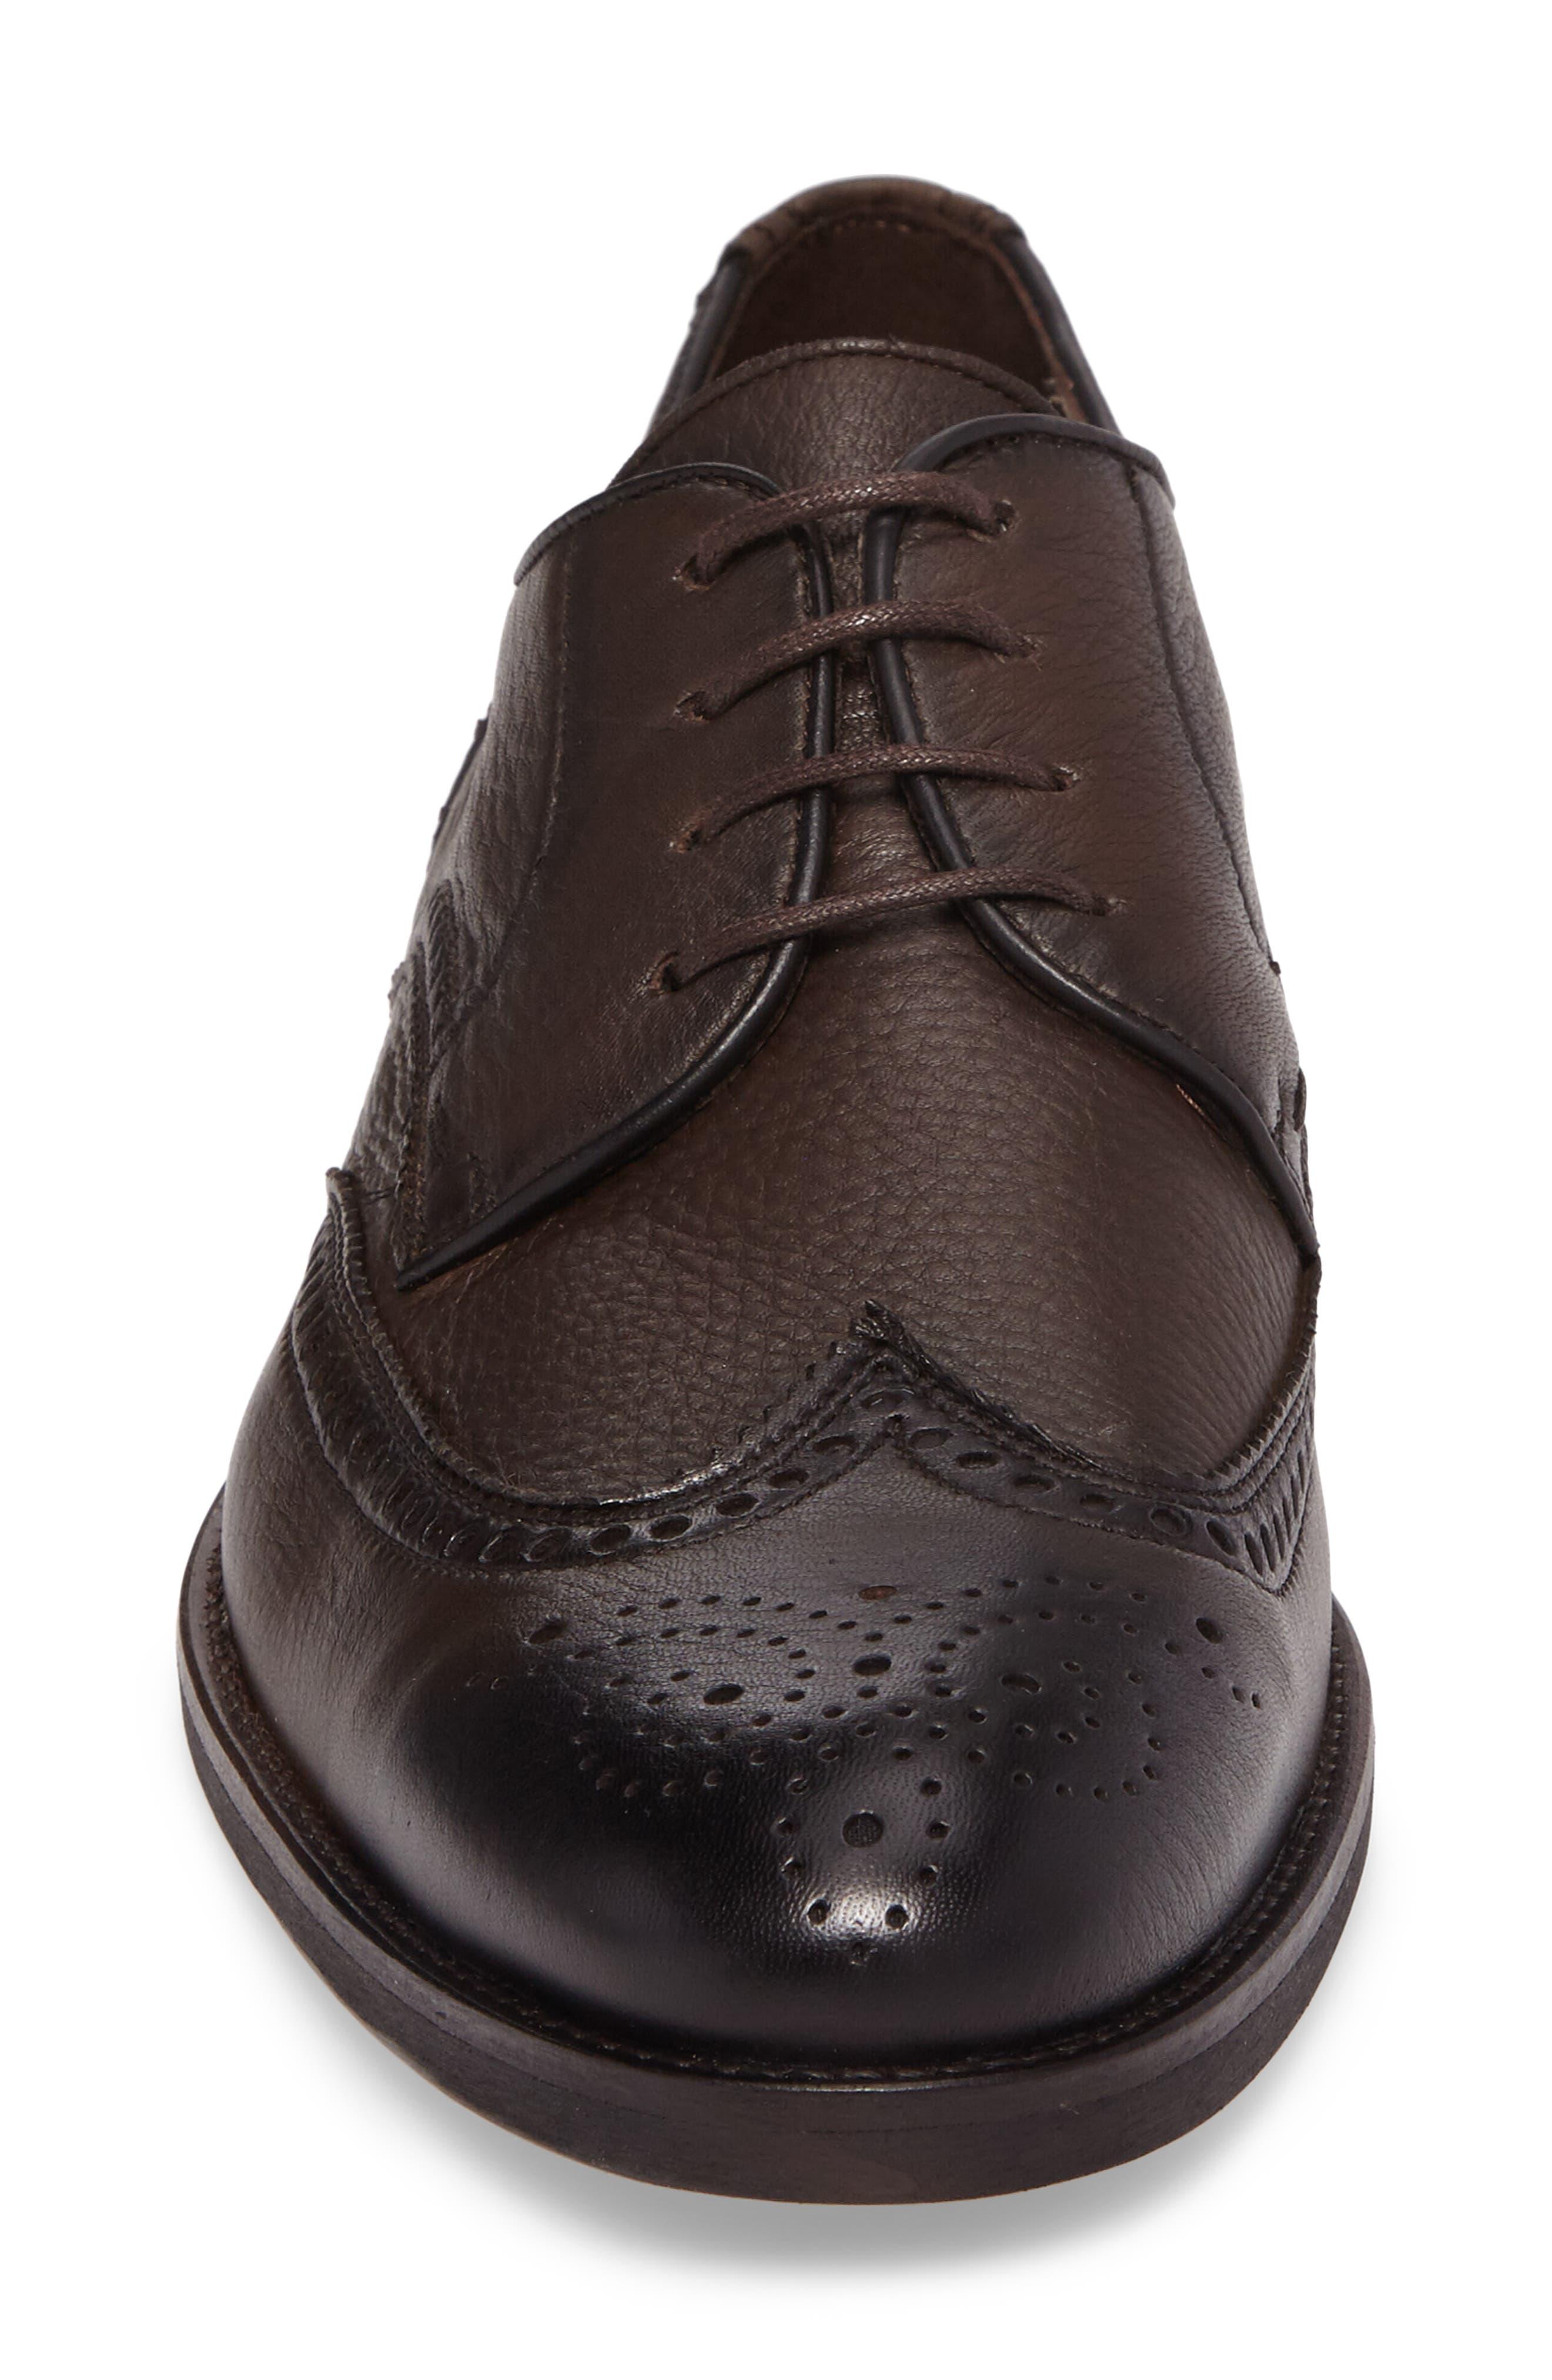 Rinaldi Wingtip,                             Alternate thumbnail 4, color,                             Ebano Leather